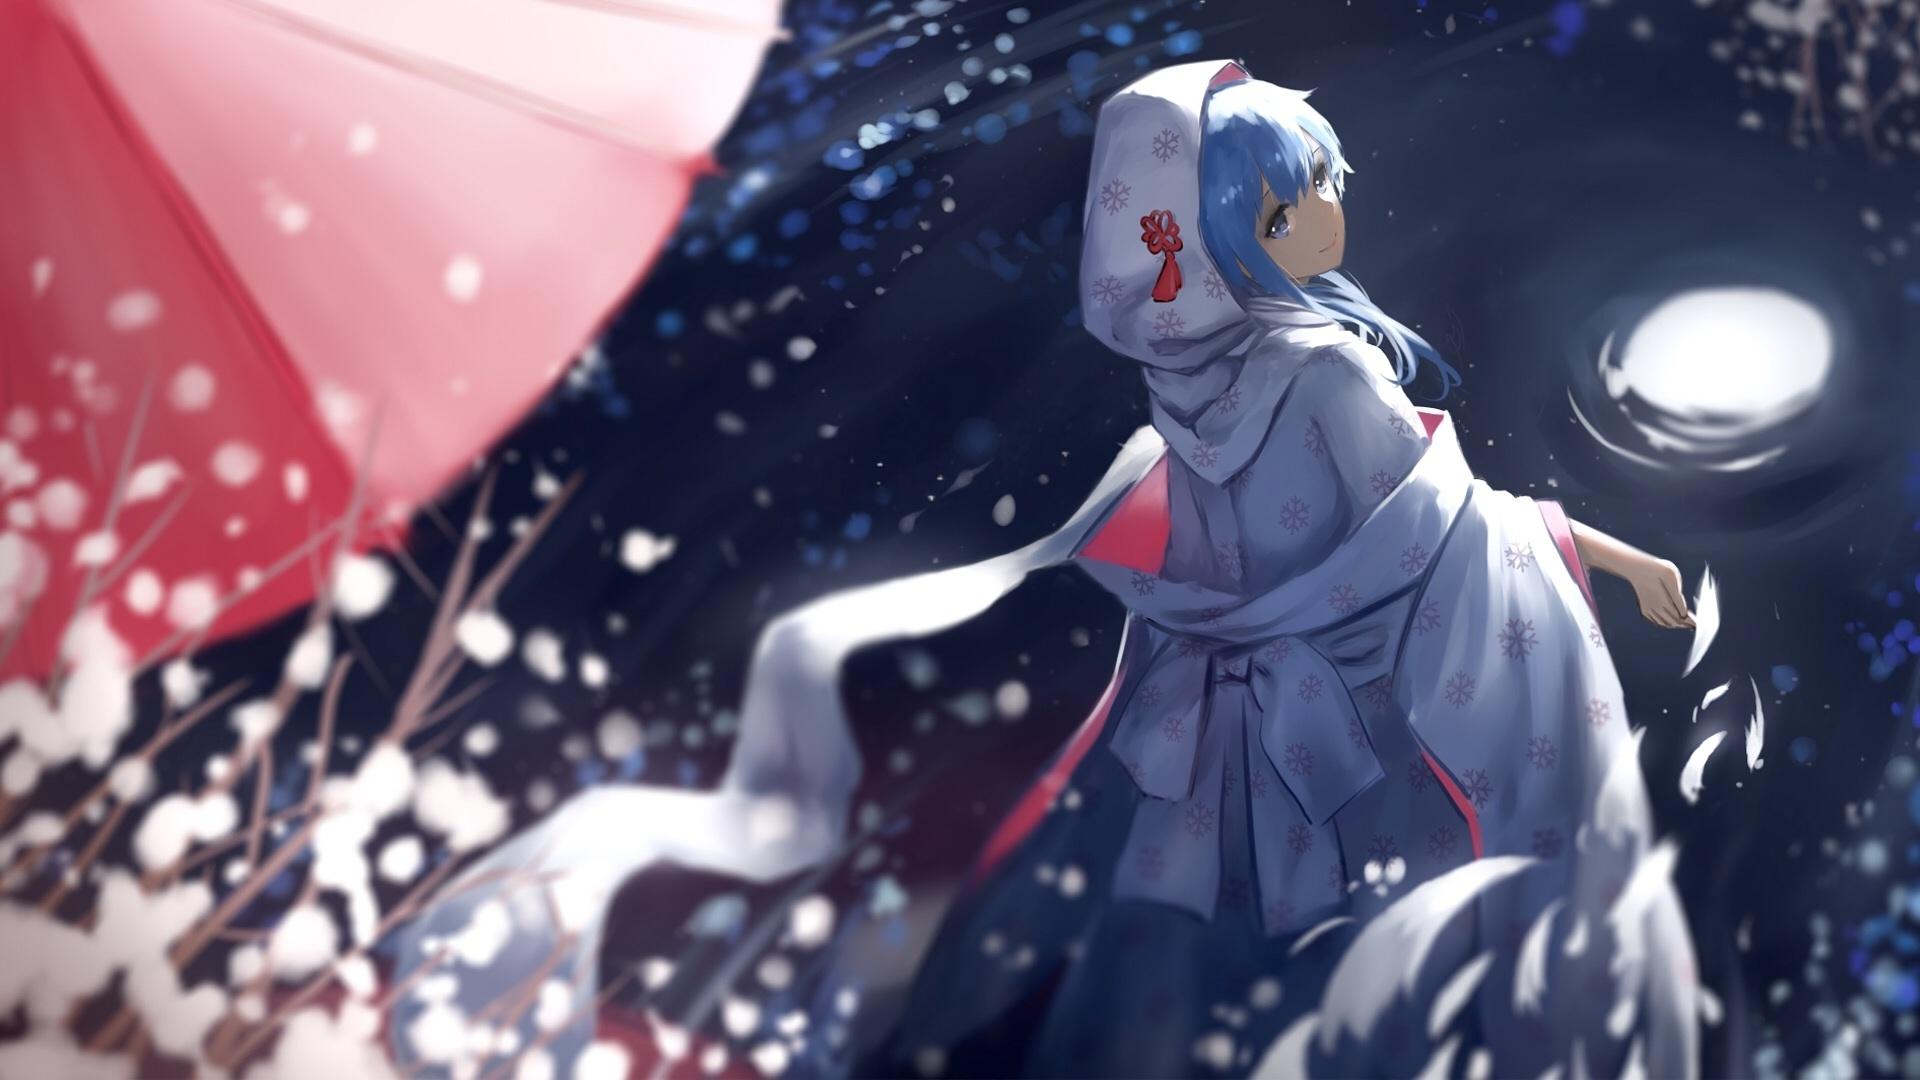 hatsune-miku-kimono-snow-winter-vocaloid-petals-anime-11141.jpg